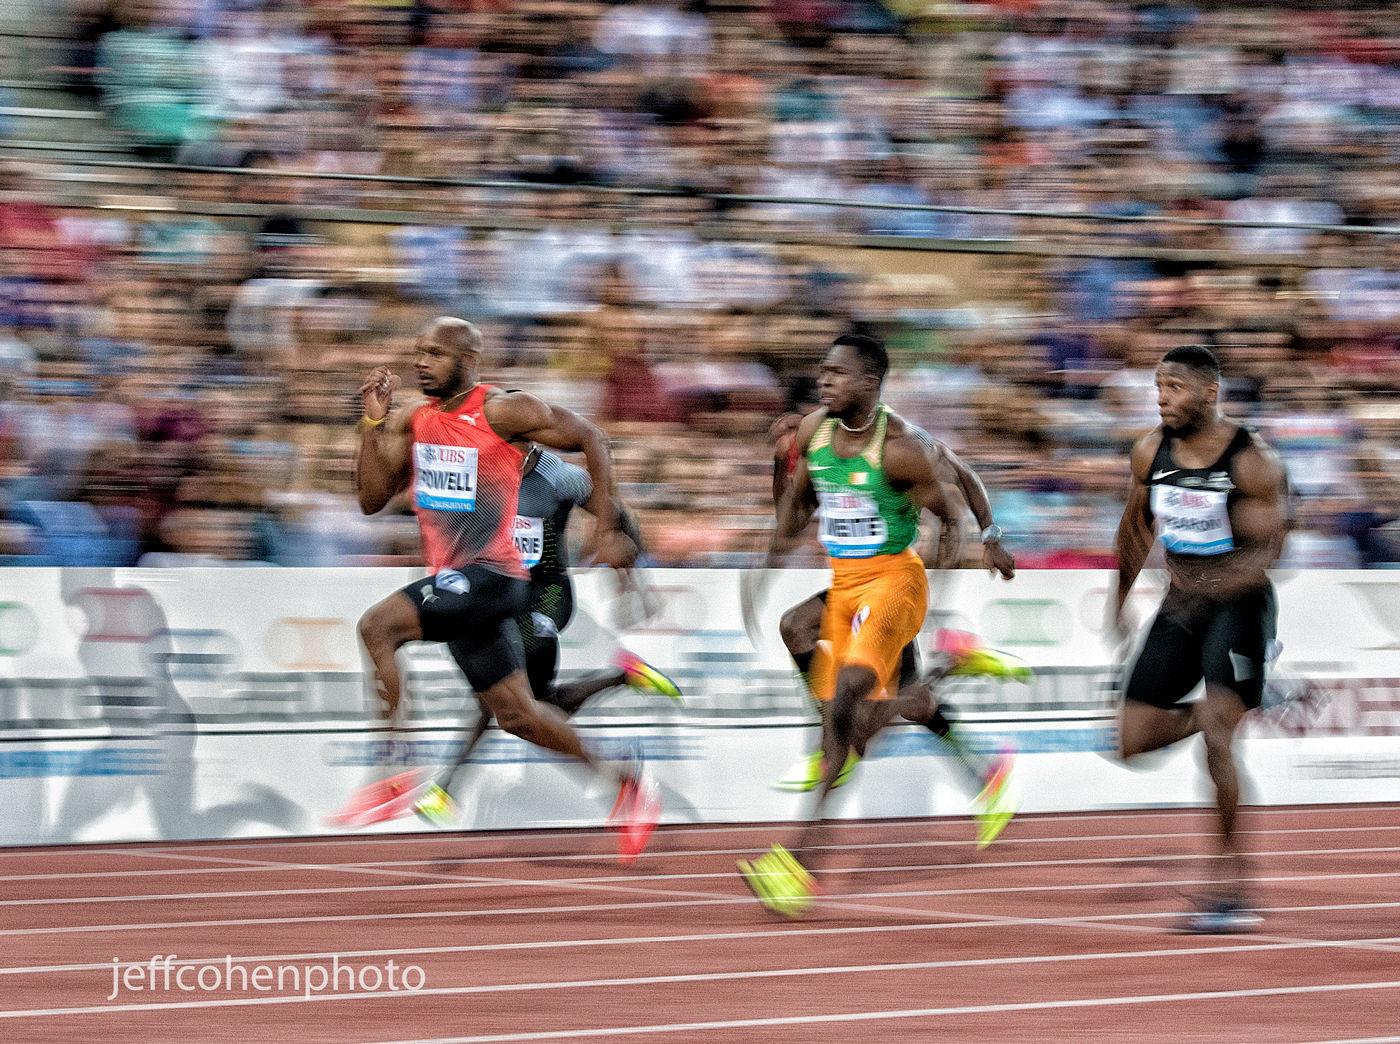 1r2016_athletissima_lausanne_powell_100m_jeff_cohen_photo_1087_web.jpg